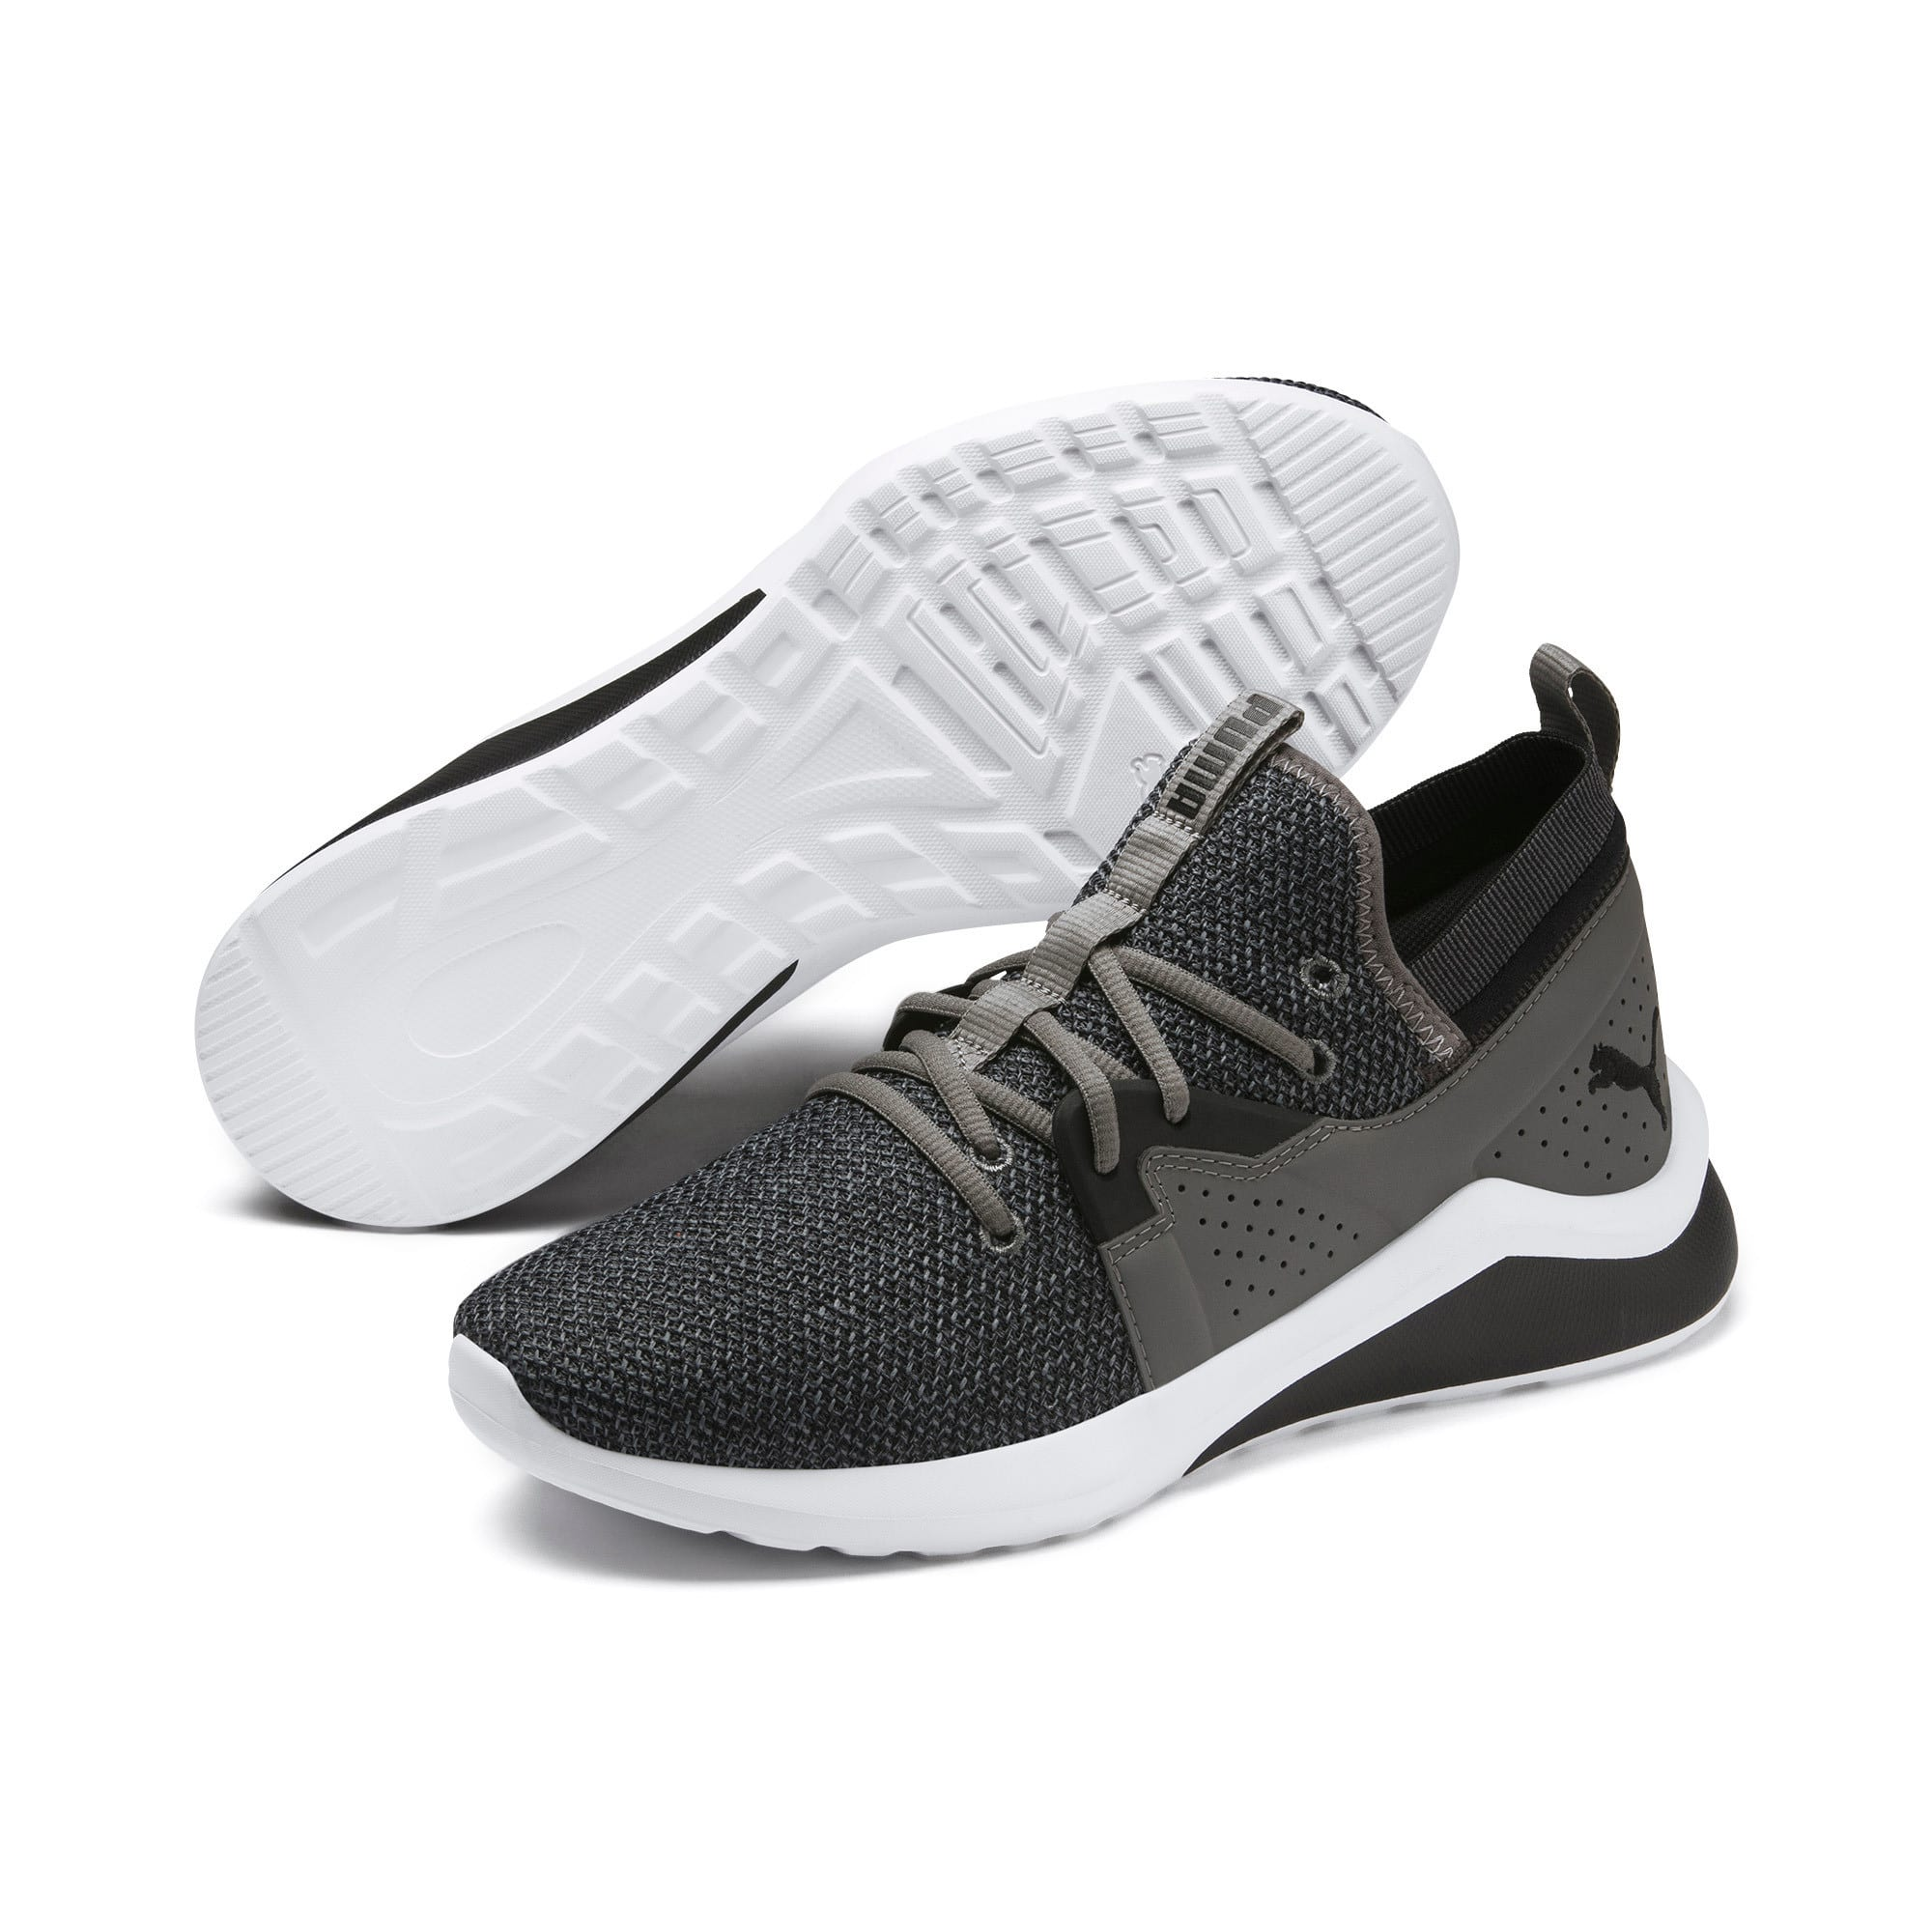 Miniatura 2 de Zapatos deportivos Emergence para hombre, CASTLEROCK-Puma Black, mediano